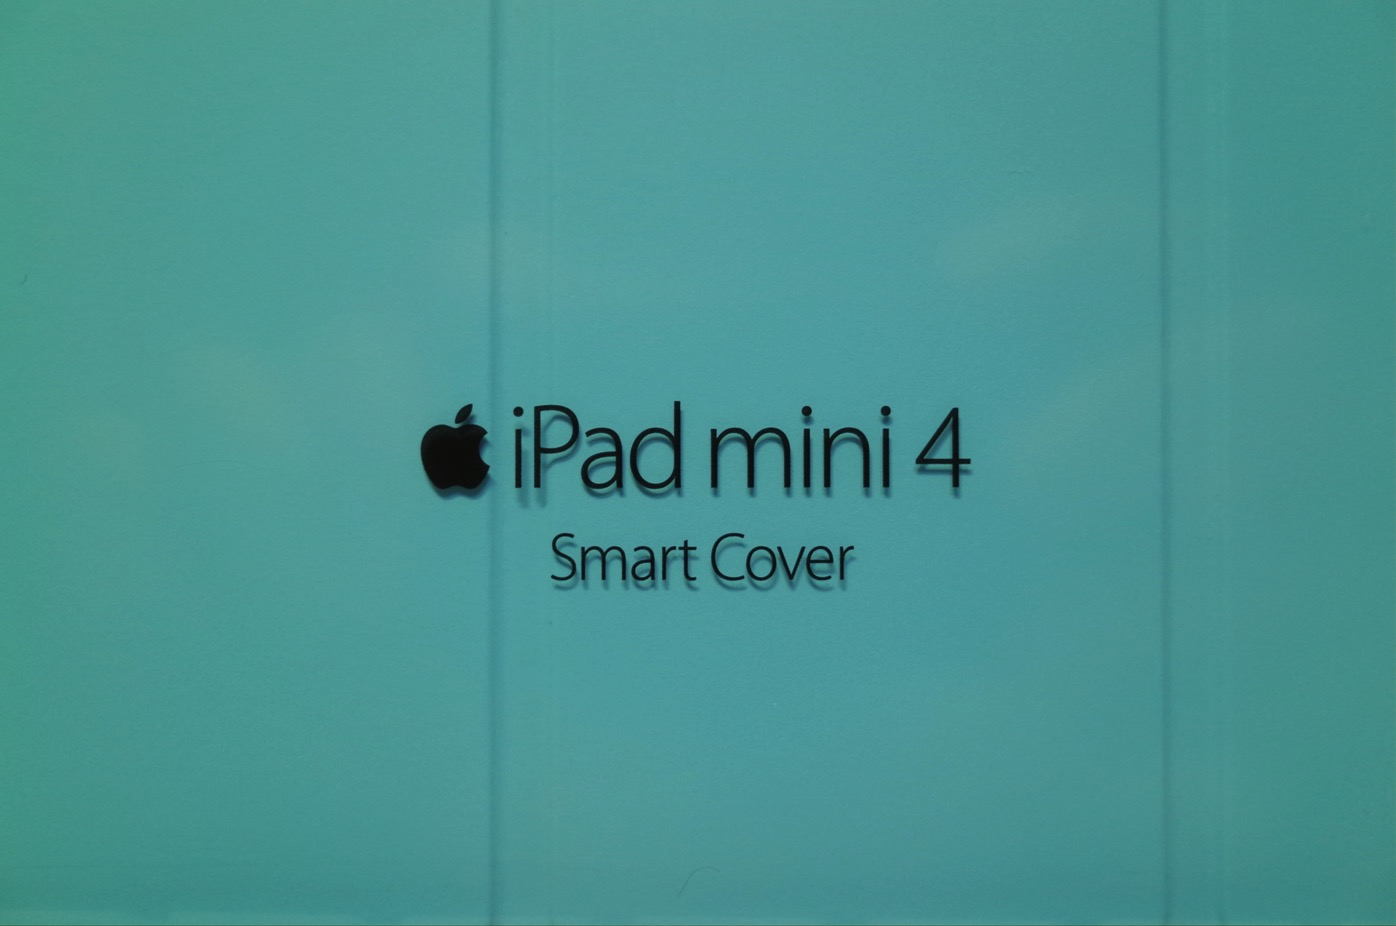 [Apple] iPad mini 4 純正 Smart Coverはしっくりしっかりしたスマートなカバー